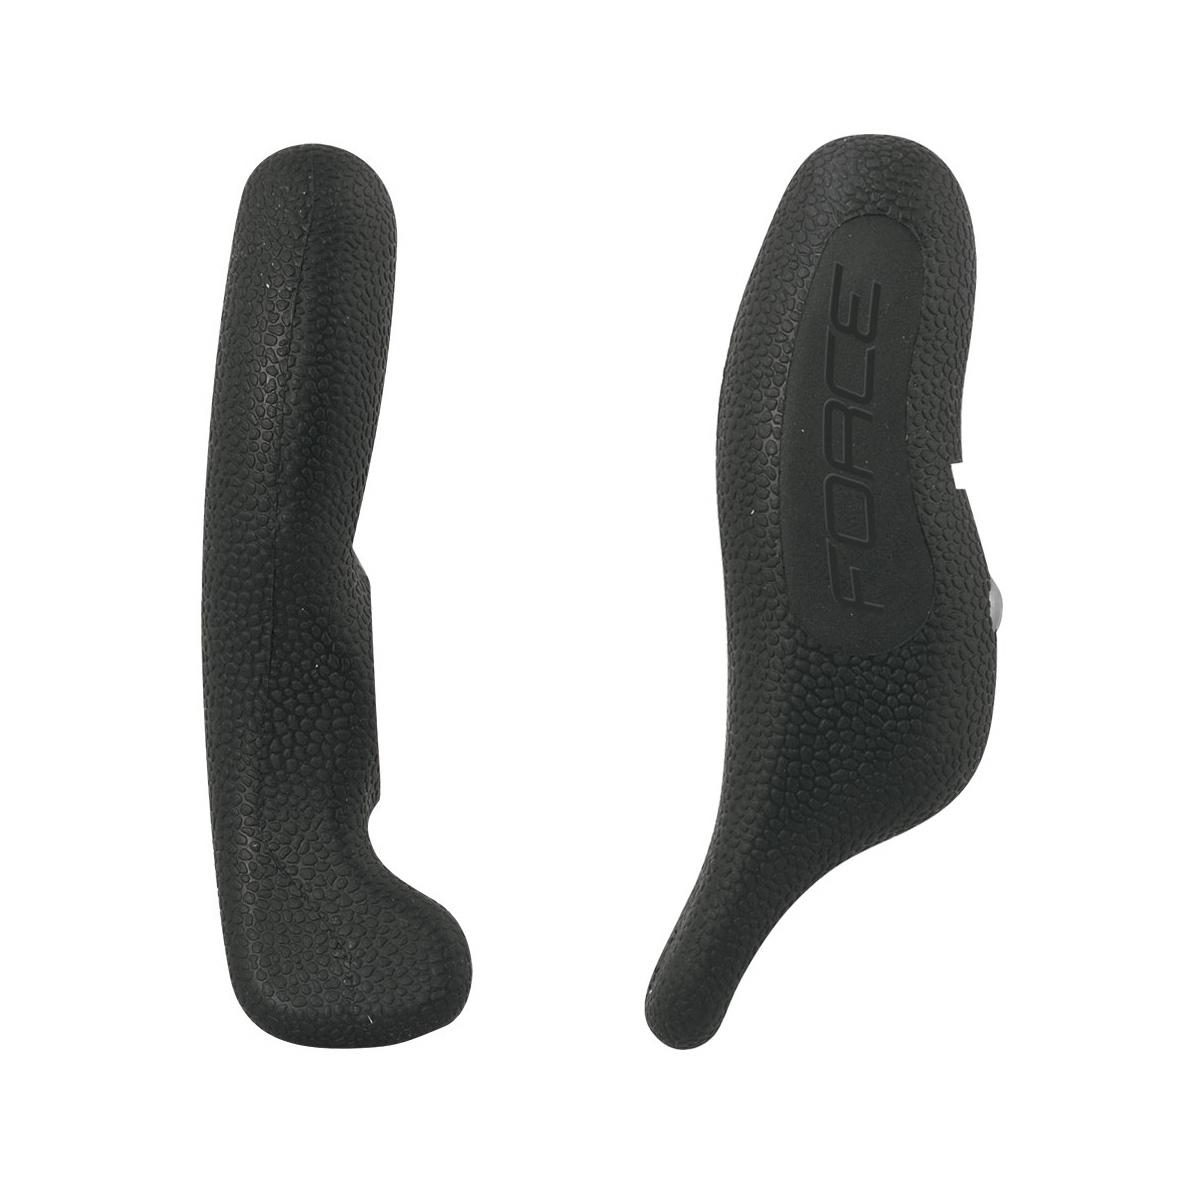 Force rohy Rab Al 12 cm AL+guma černé